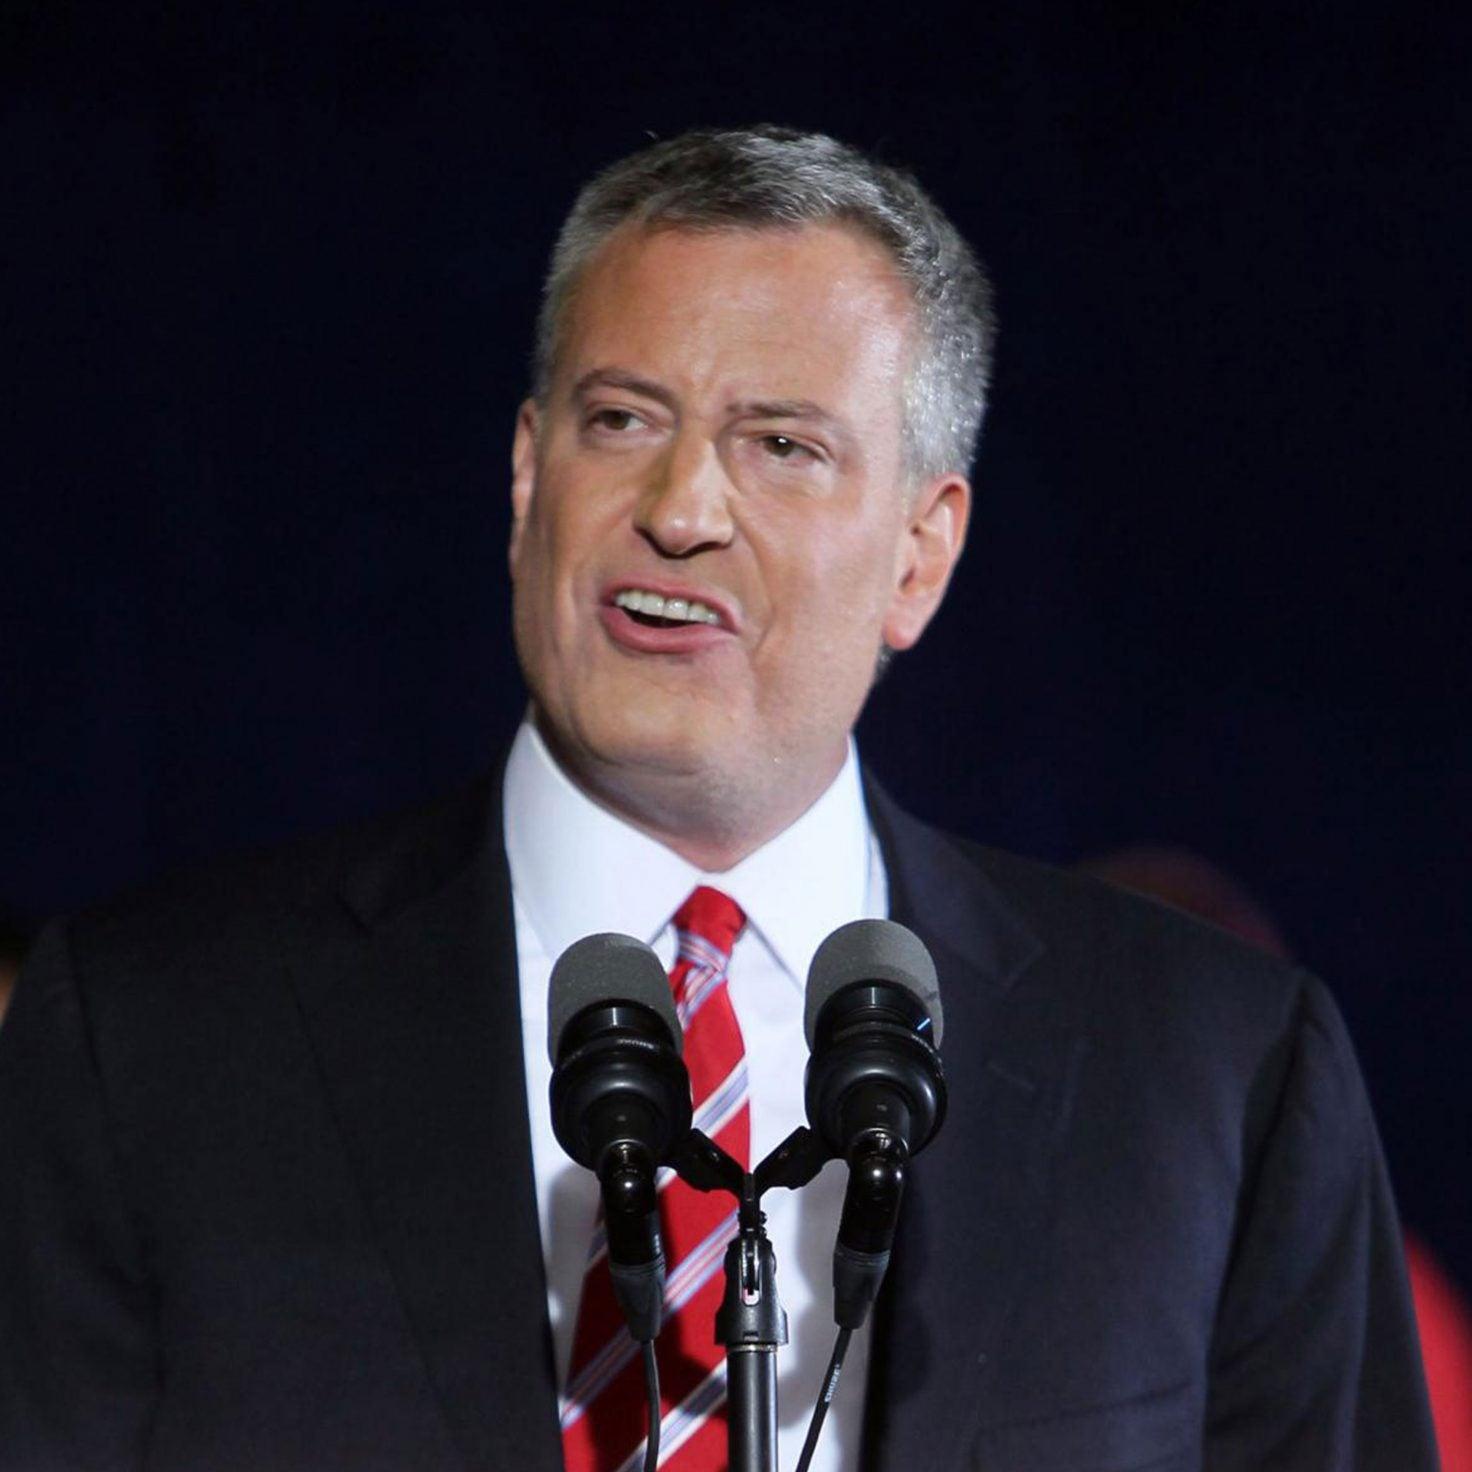 New York City Mayor Bill De Blasio Joins 2020 Presidential Race